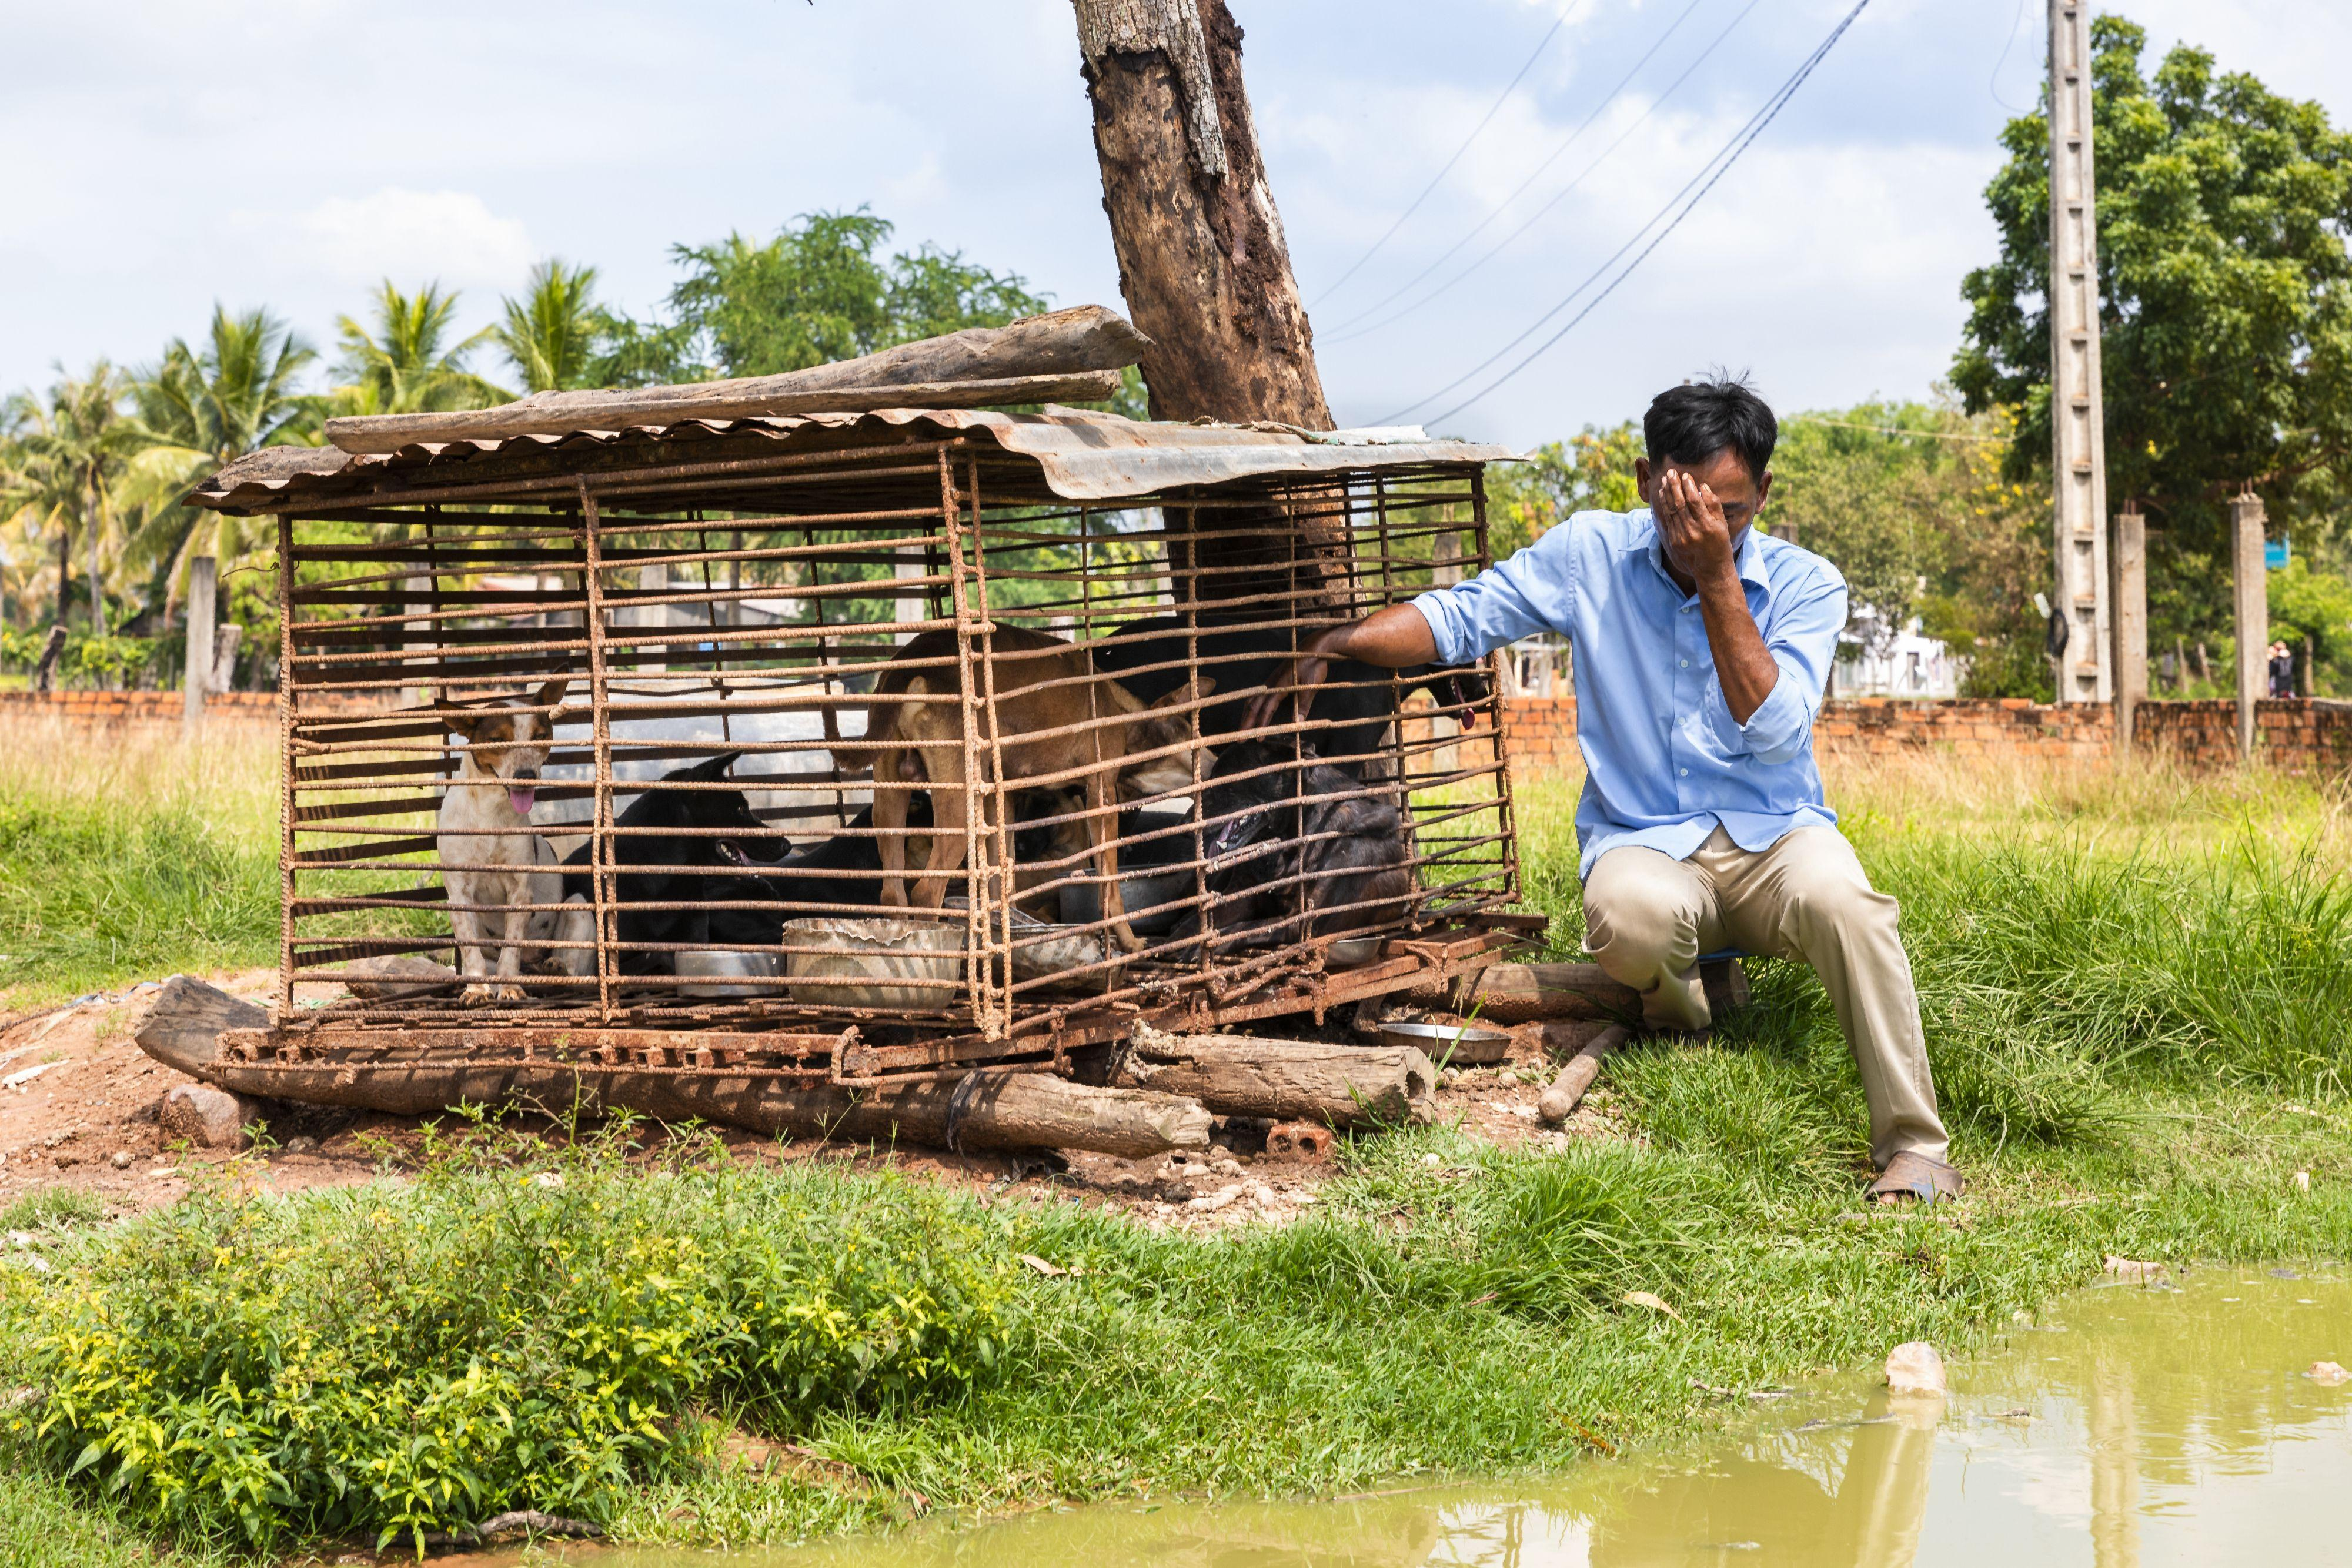 Reddingsactie slachthuis Cambodja